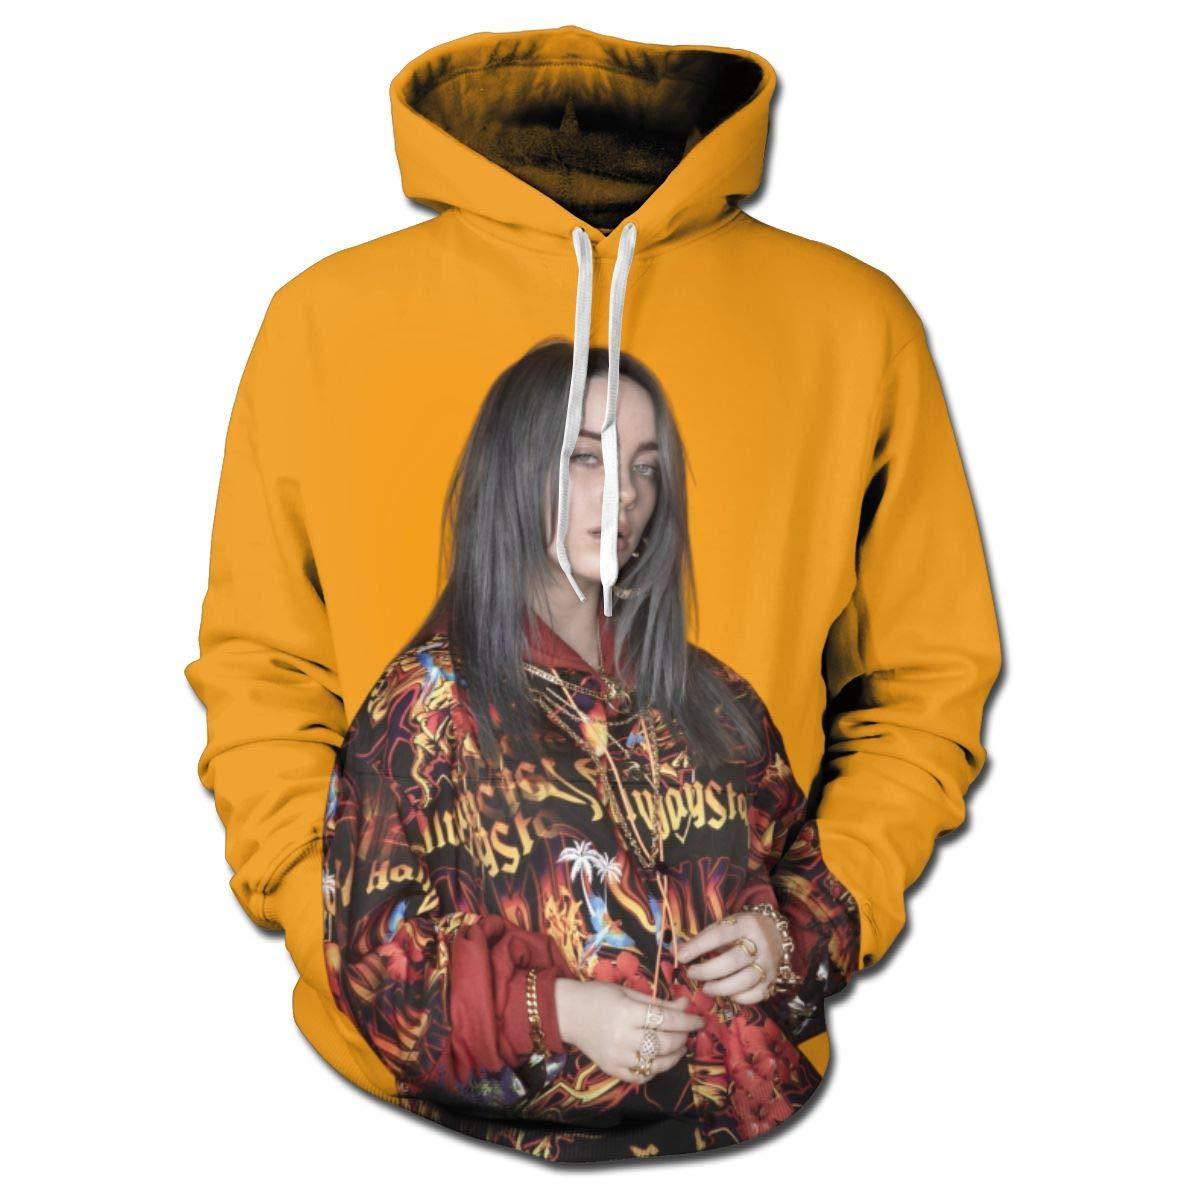 SHOEWPQIA Women's Billie Eilish 3D Print Pullover Hooded Sweatshirt Hoodies with Pockets